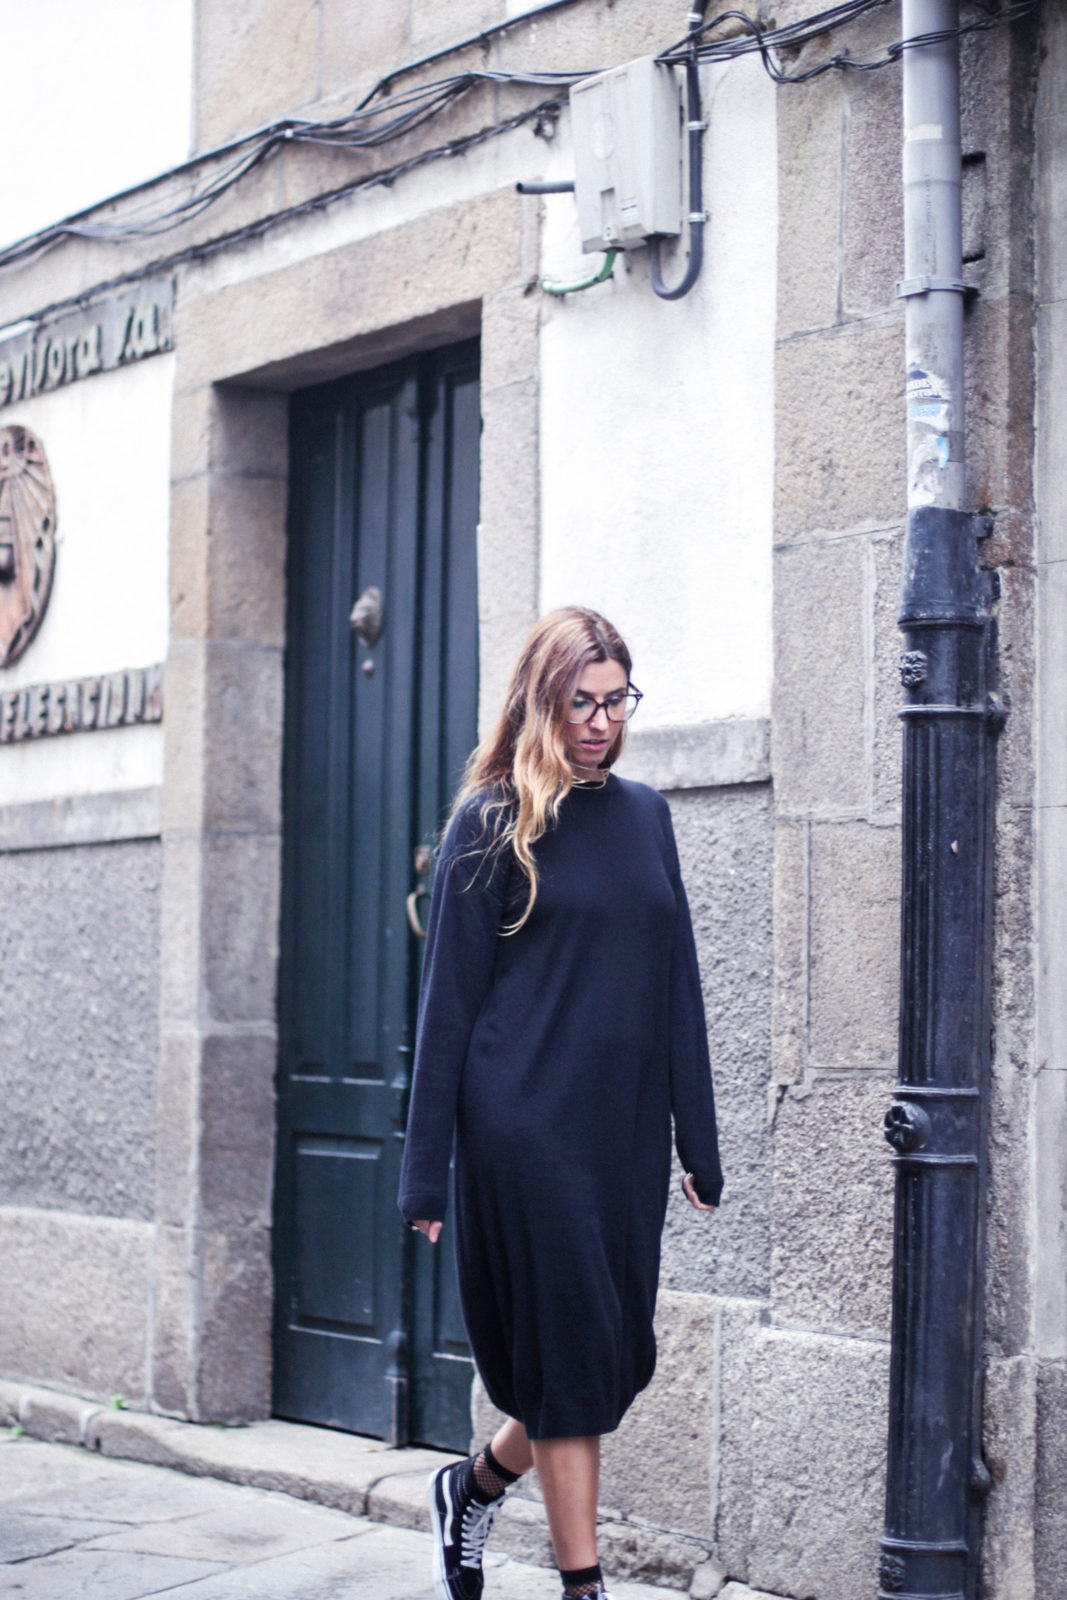 vestido_de_punto_midi_vans_calcetines_rejilla_choker_metalico_happiness_boutique_abrigo_largo_gucci_street_style_fall_2016_donkeycool-38